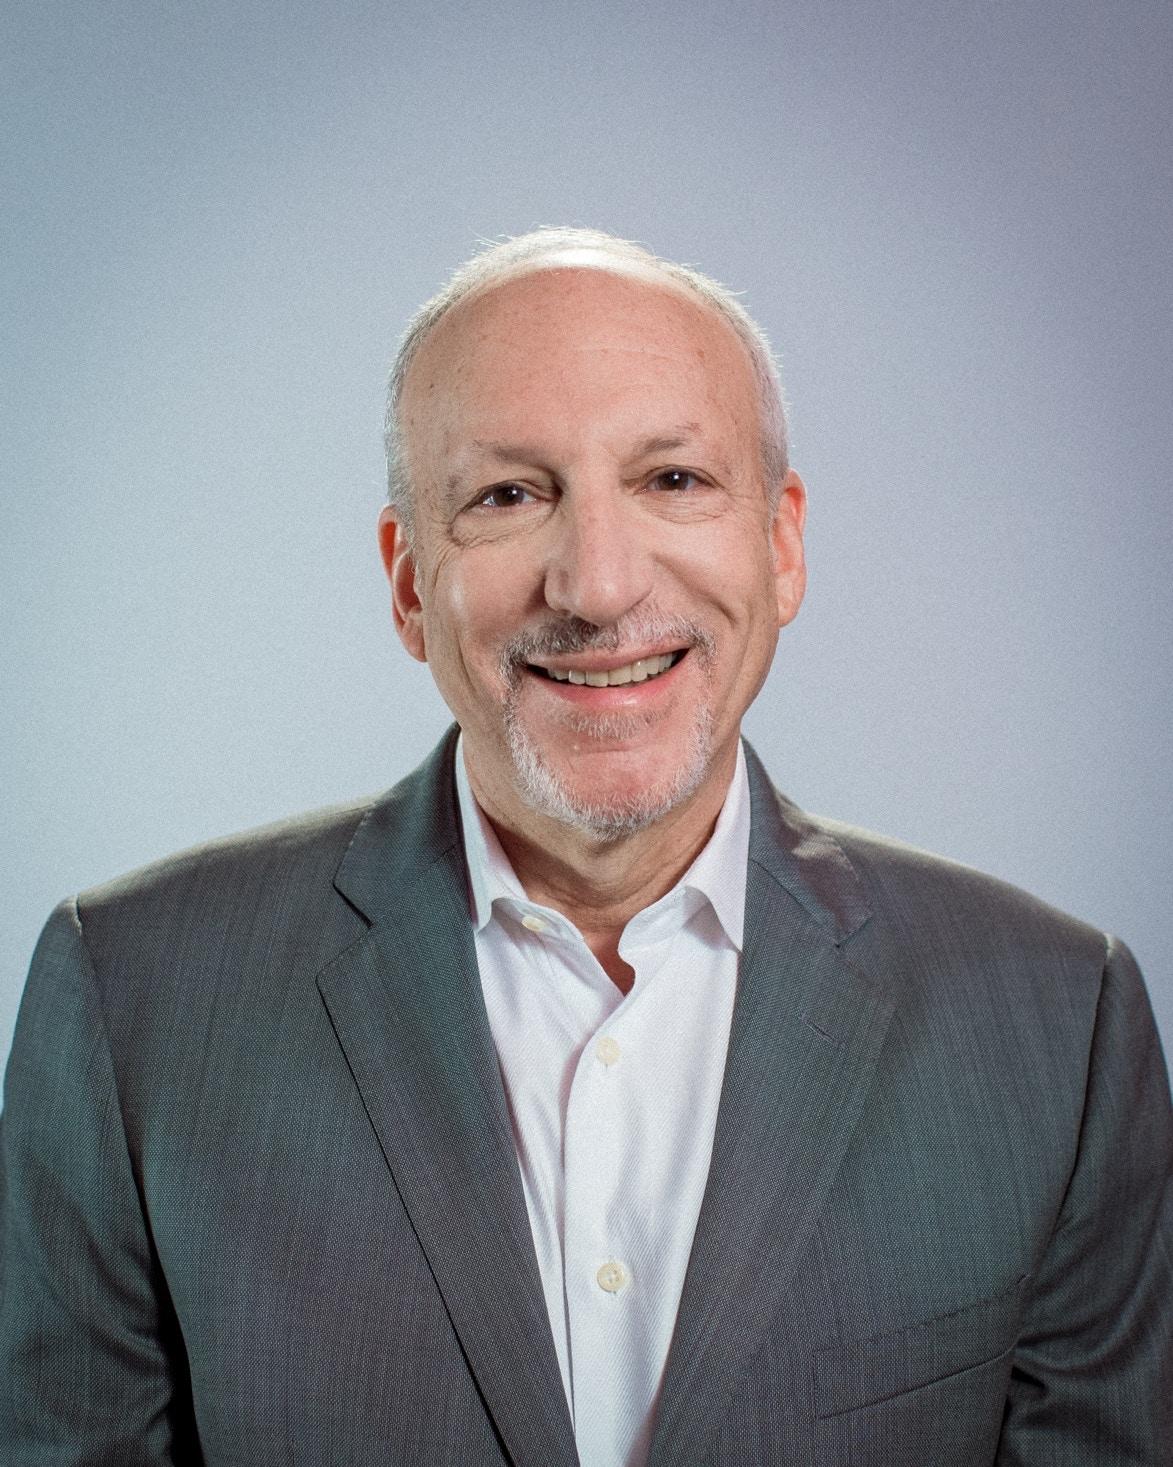 Lee Schwartzberg - Chief Medical Officer